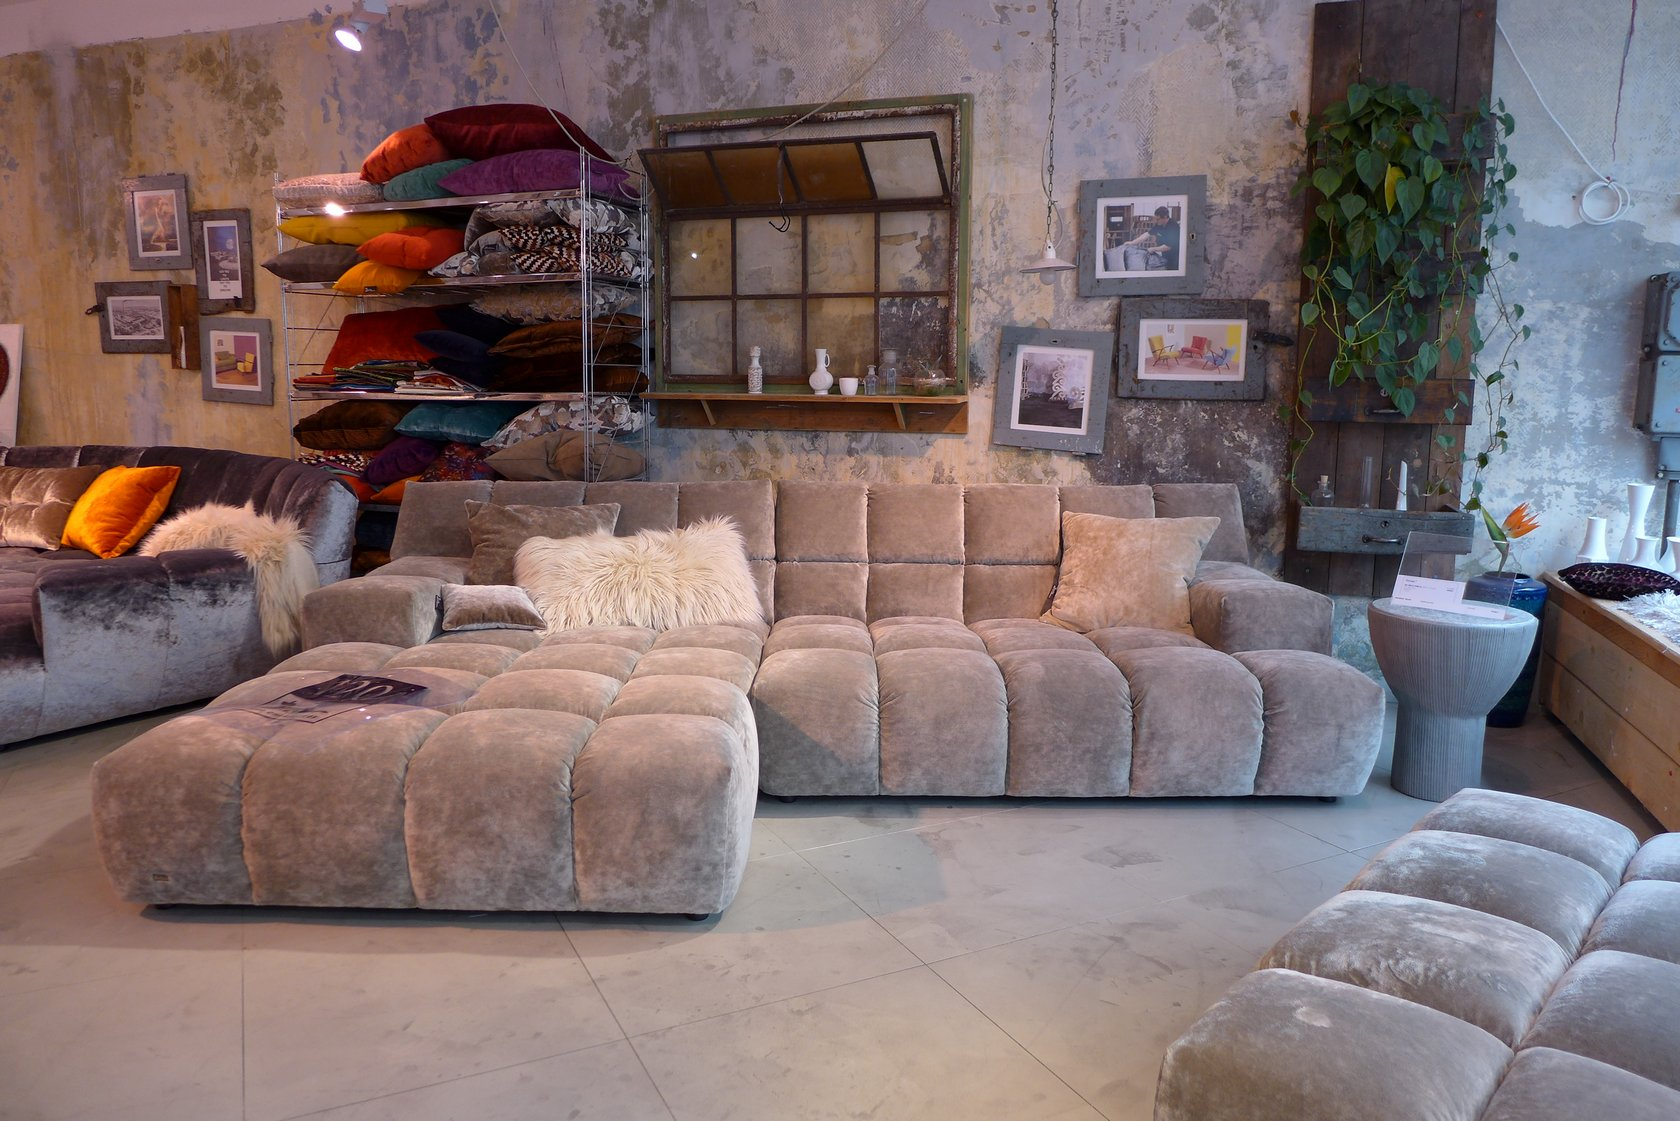 bretz sofa outlet corner sofa chocolat collection by bretz wohntrume design bretz brothers. Black Bedroom Furniture Sets. Home Design Ideas